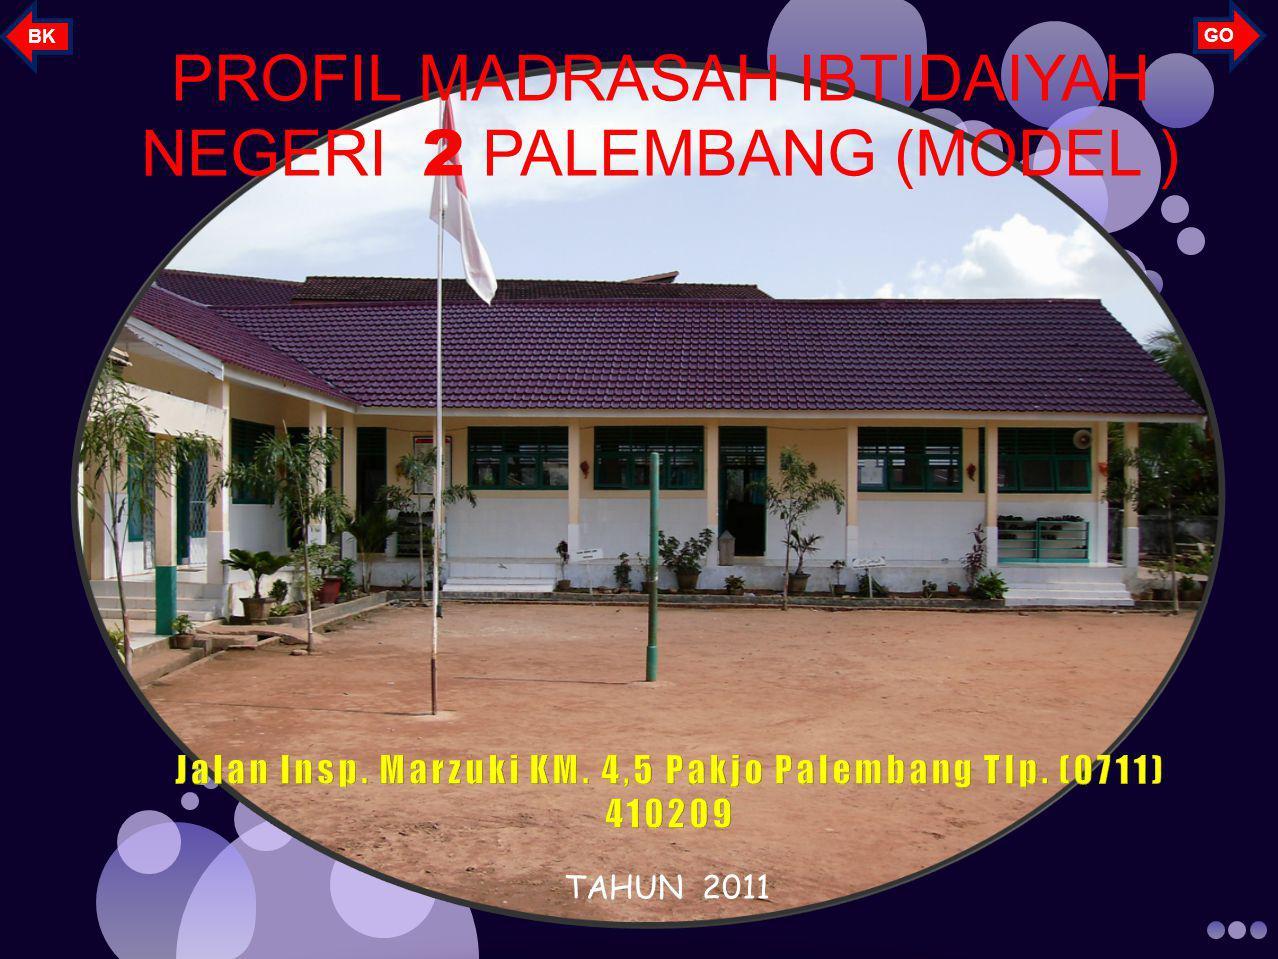 Jalan Insp. Marzuki KM. 4,5 Pakjo Palembang Tlp. (0711) 410209